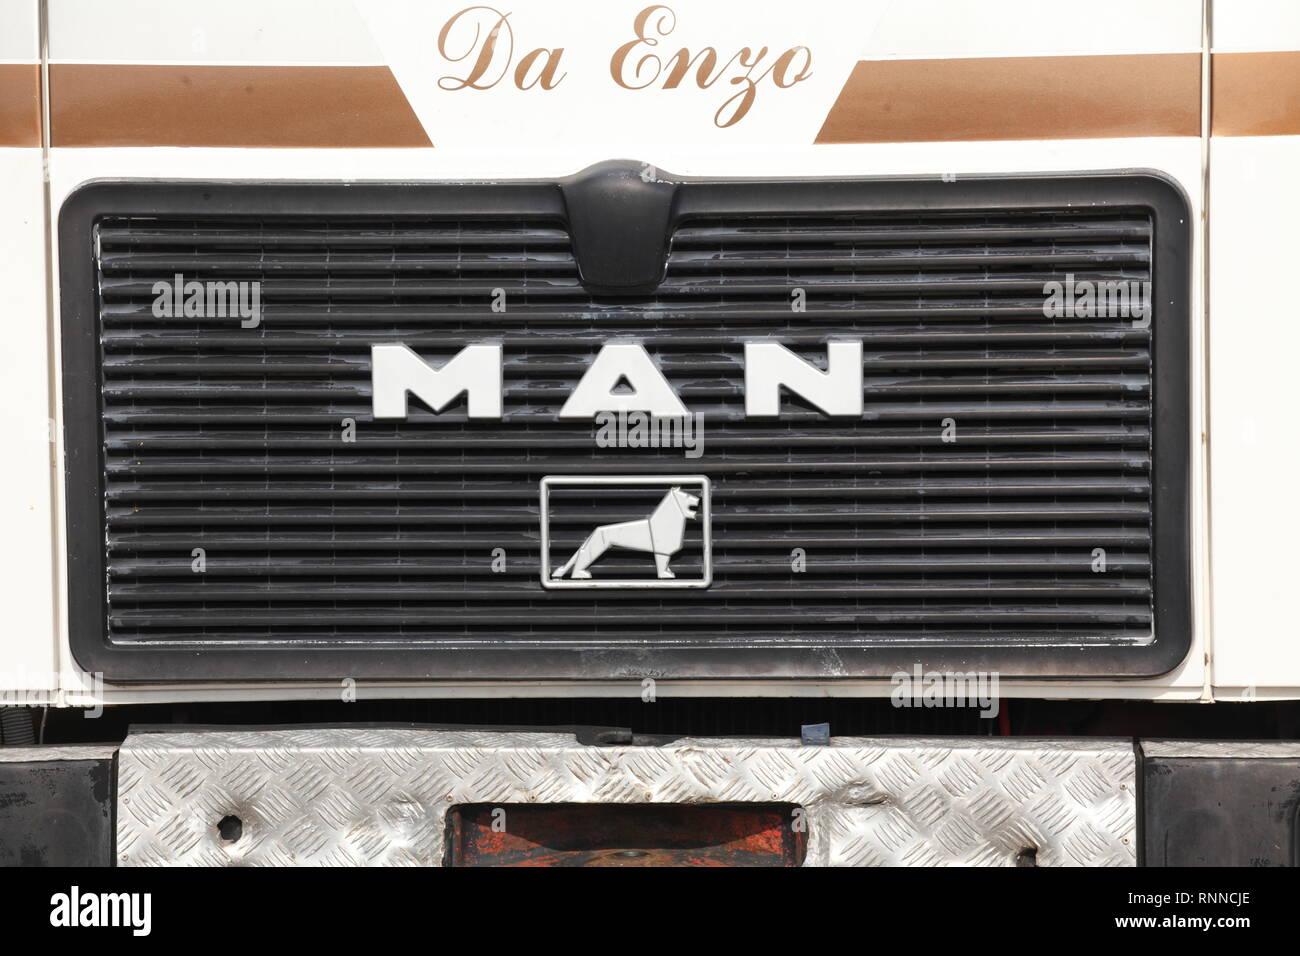 Company logo MAN on the radiator grille of a truck ,, Germany, Europe I Firmenlogo MAN am Kühlergrill eines Lkw,, Deutschland, Europa I - Stock Image